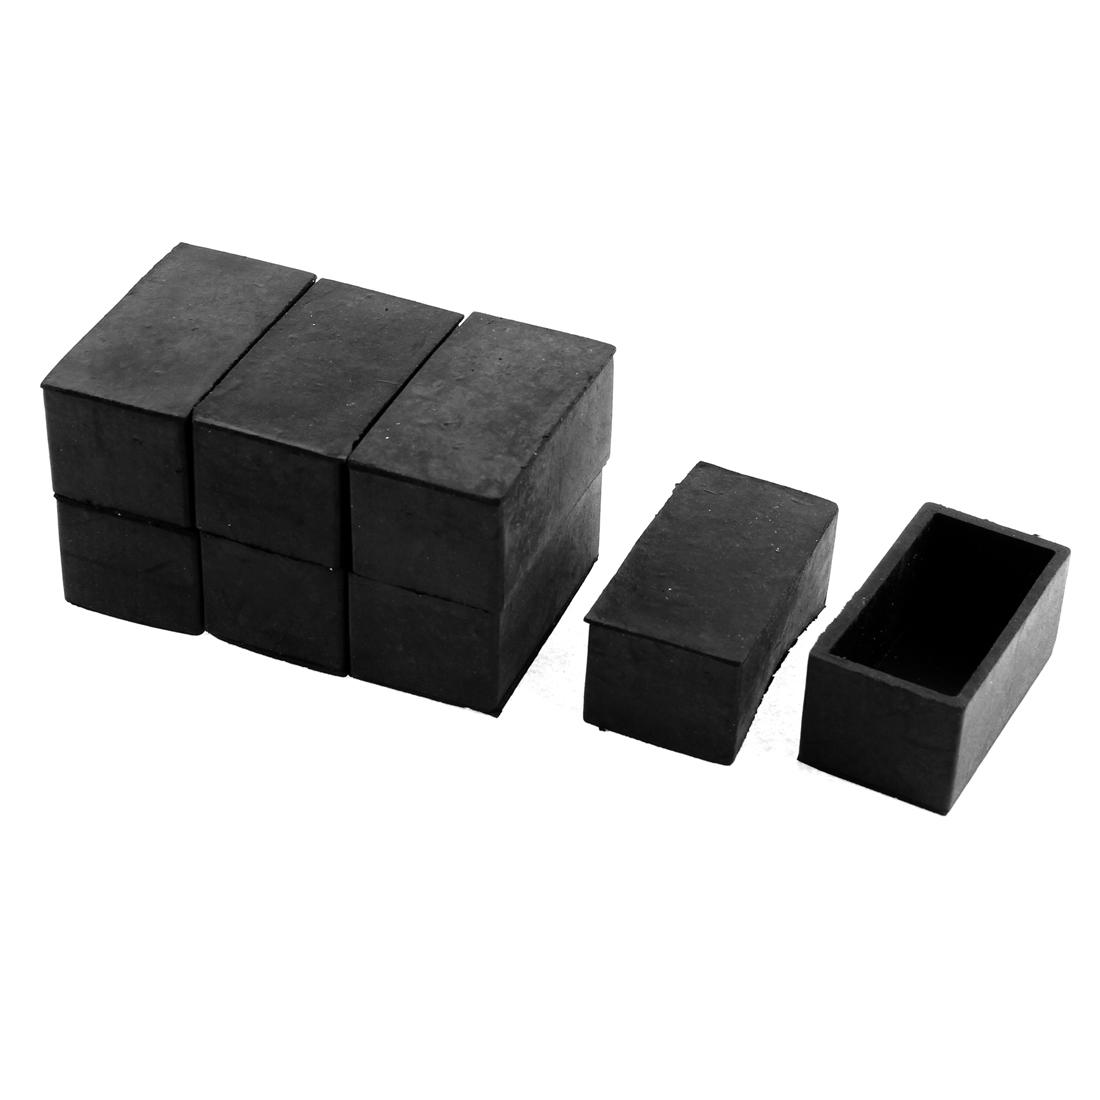 50mmx25mm Furniture Chair Leg Feet Floor Rubber Protectors Ferrules Black 8pcs<br><br>Aliexpress